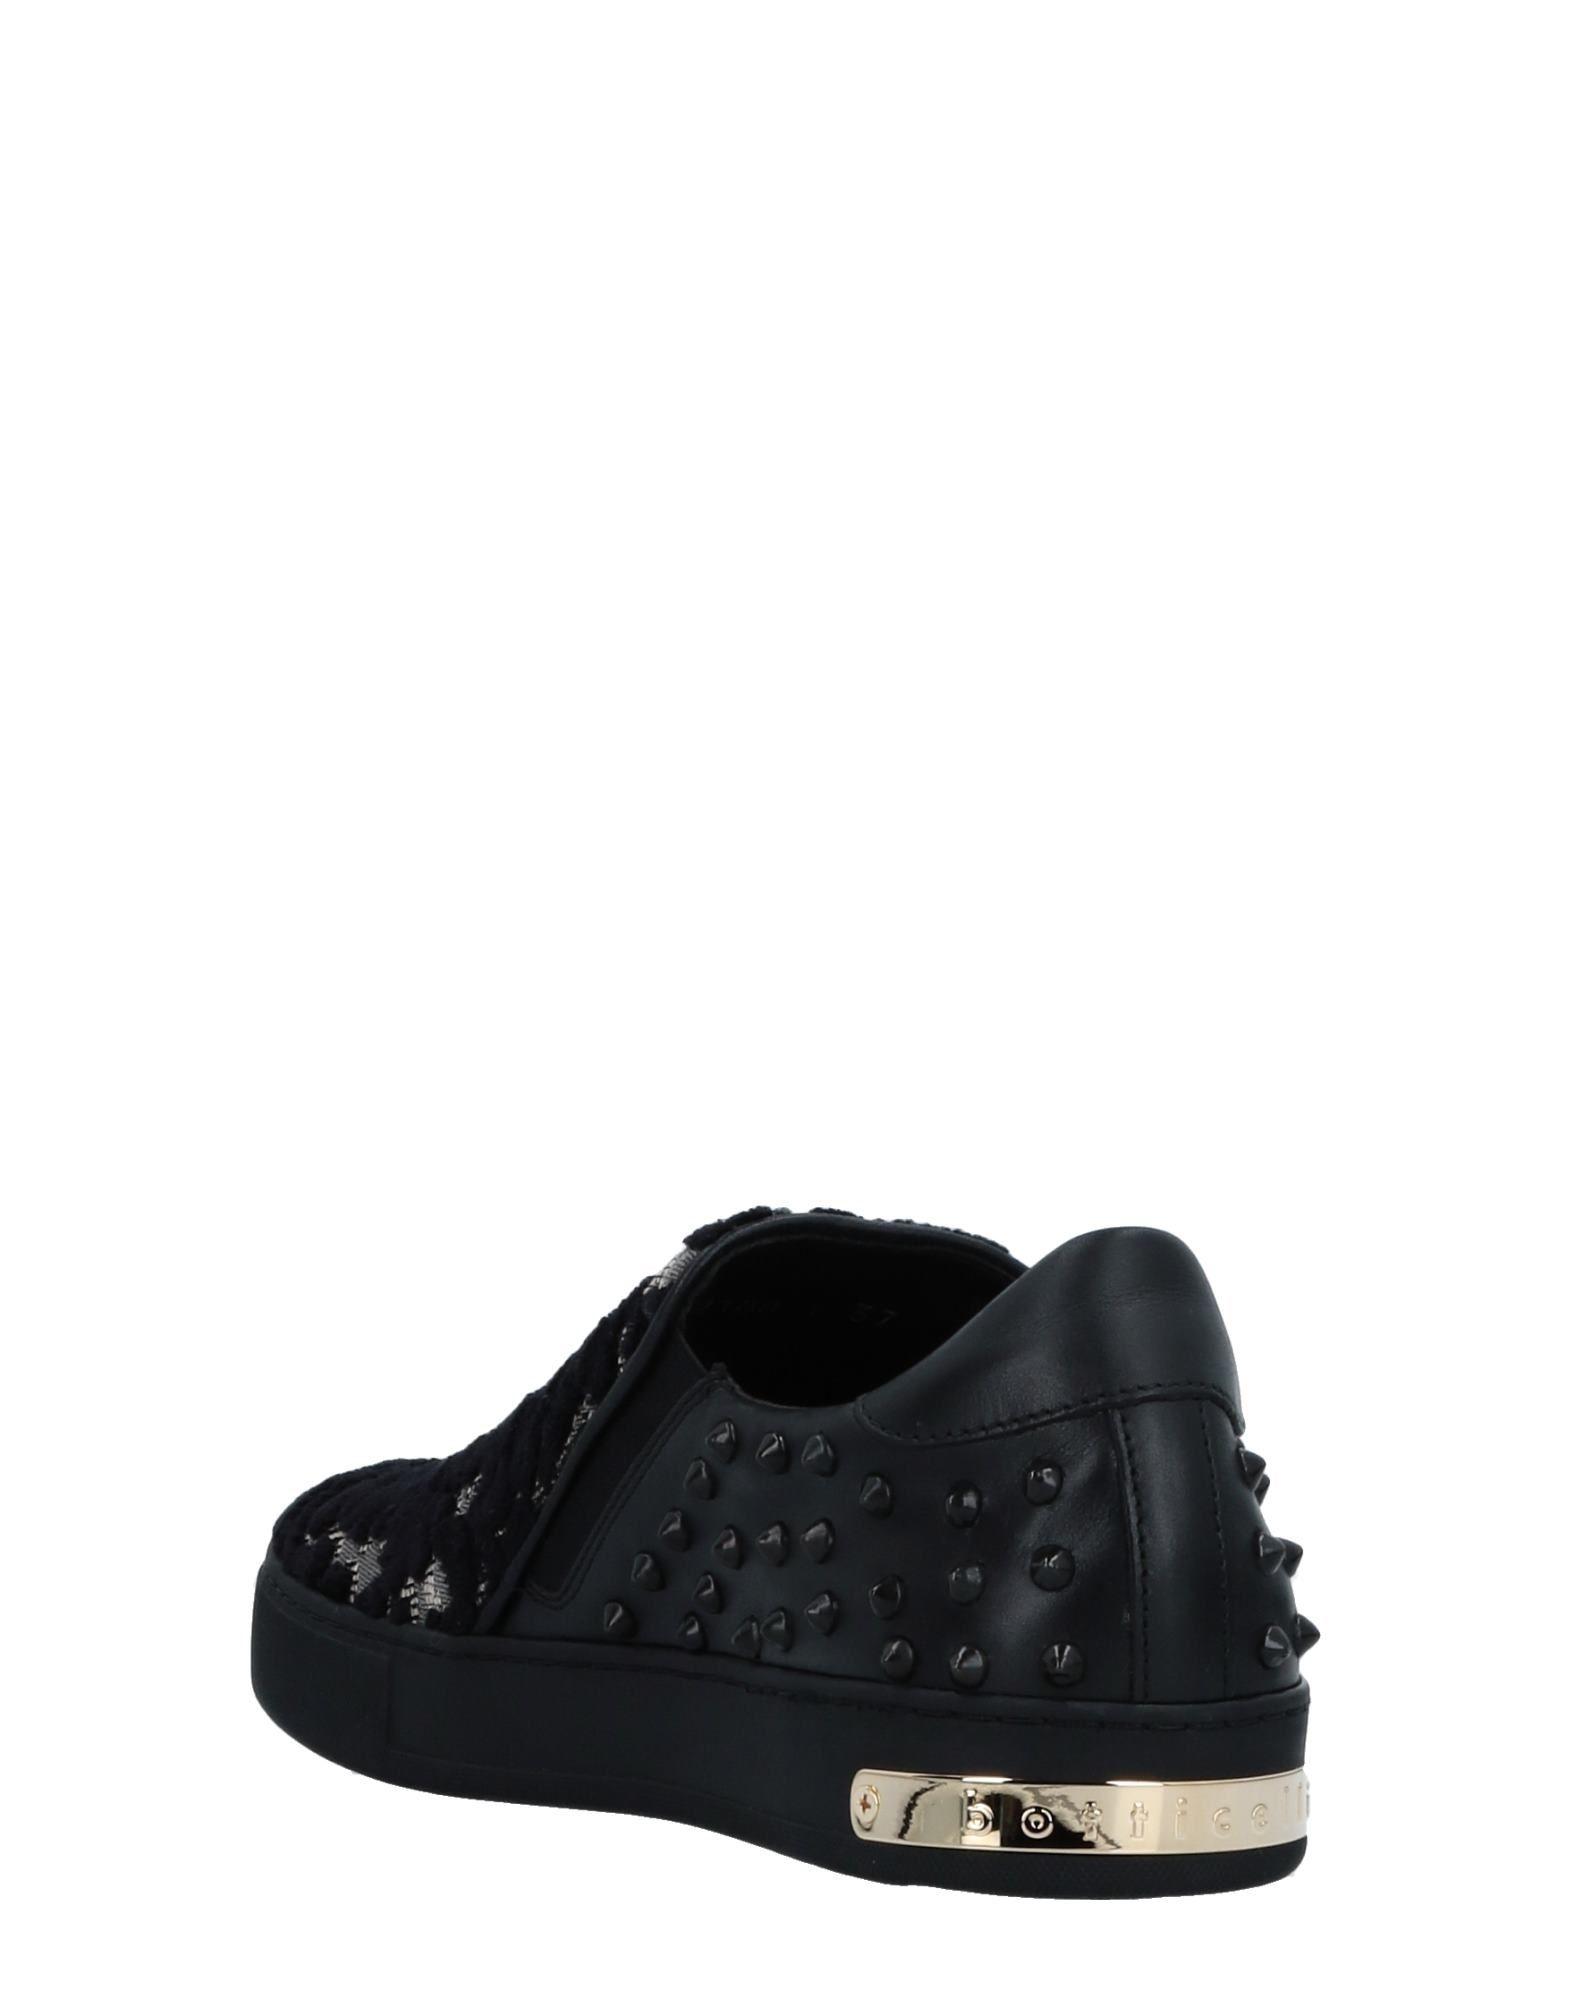 Stilvolle billige Schuhe Roberto Botticelli 11515815OO Sneakers Damen  11515815OO Botticelli cca48b